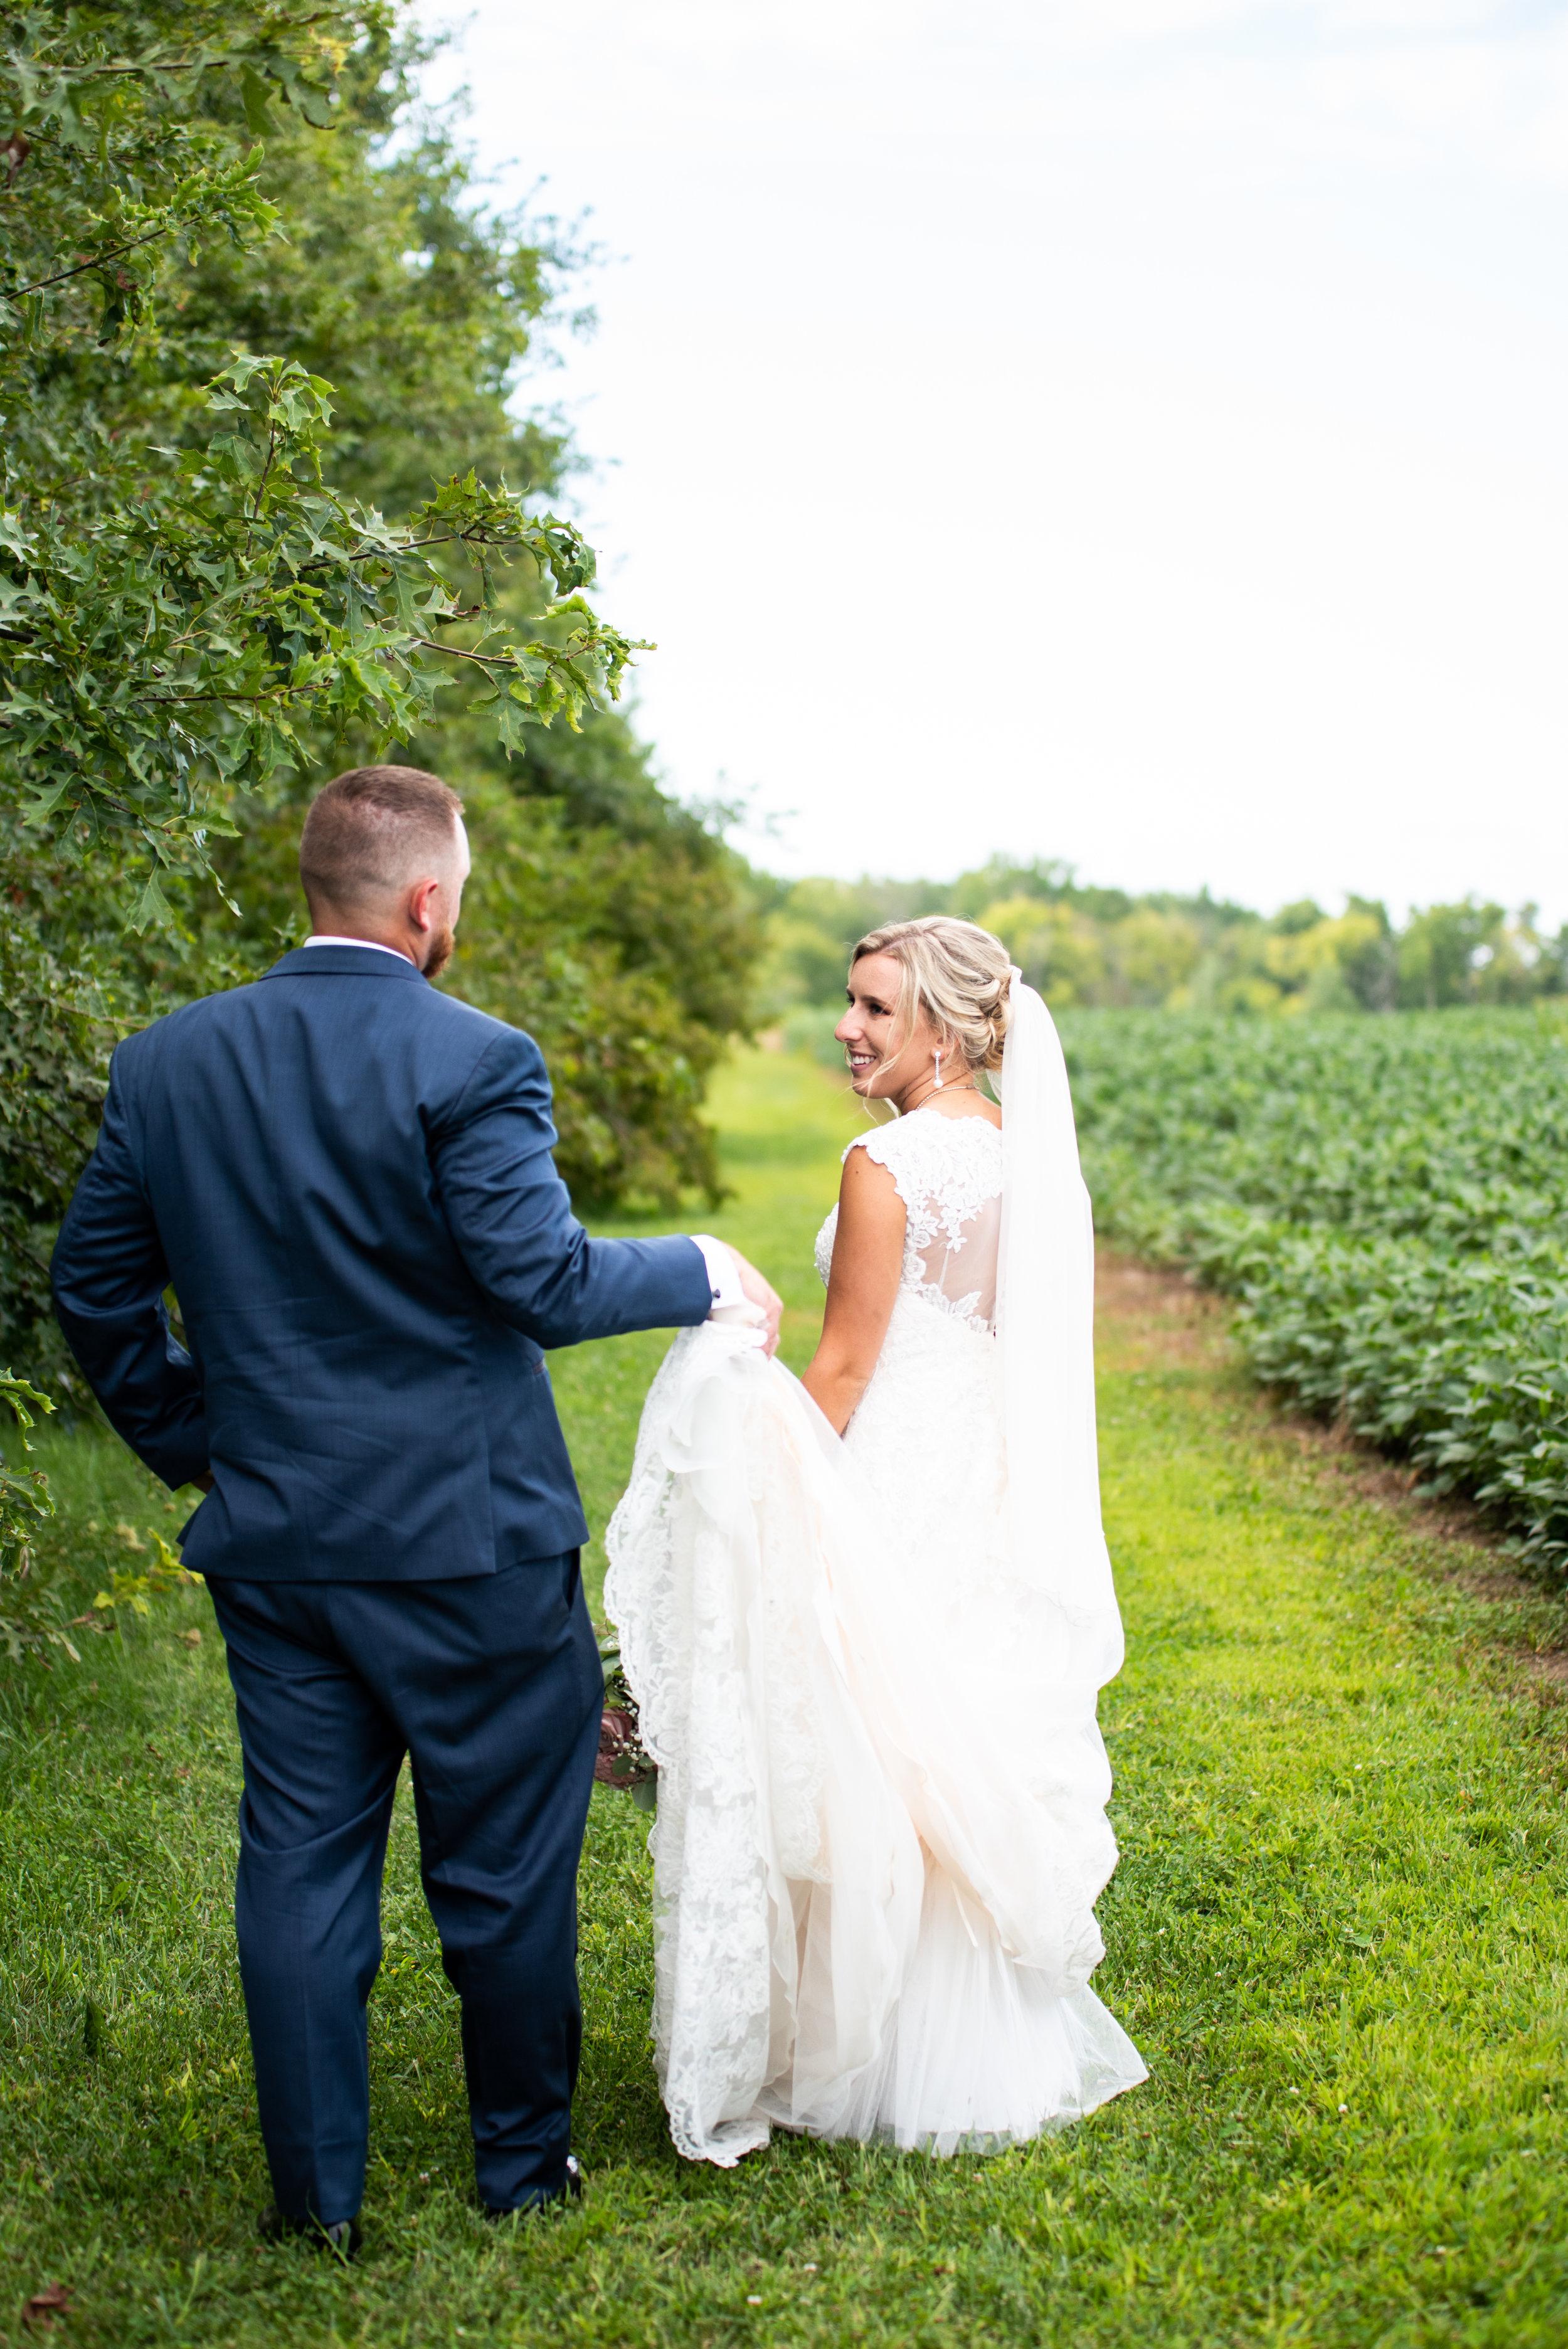 wedding (1 of 1)-141.jpg